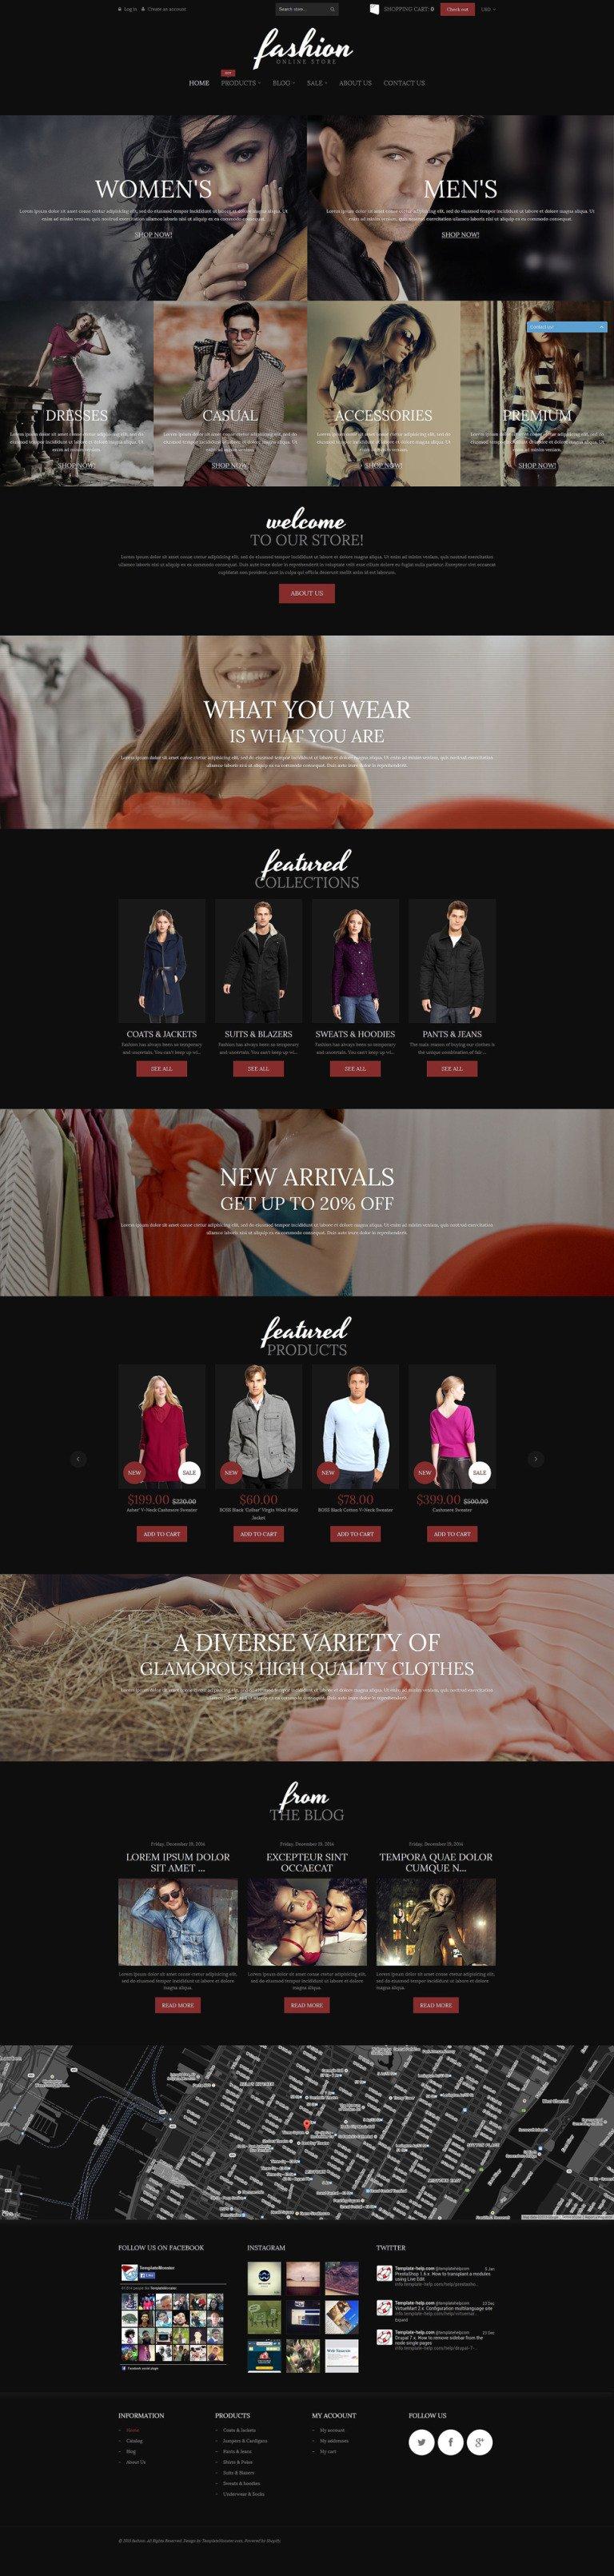 Fashion Online Store Shopify Theme New Screenshots BIG